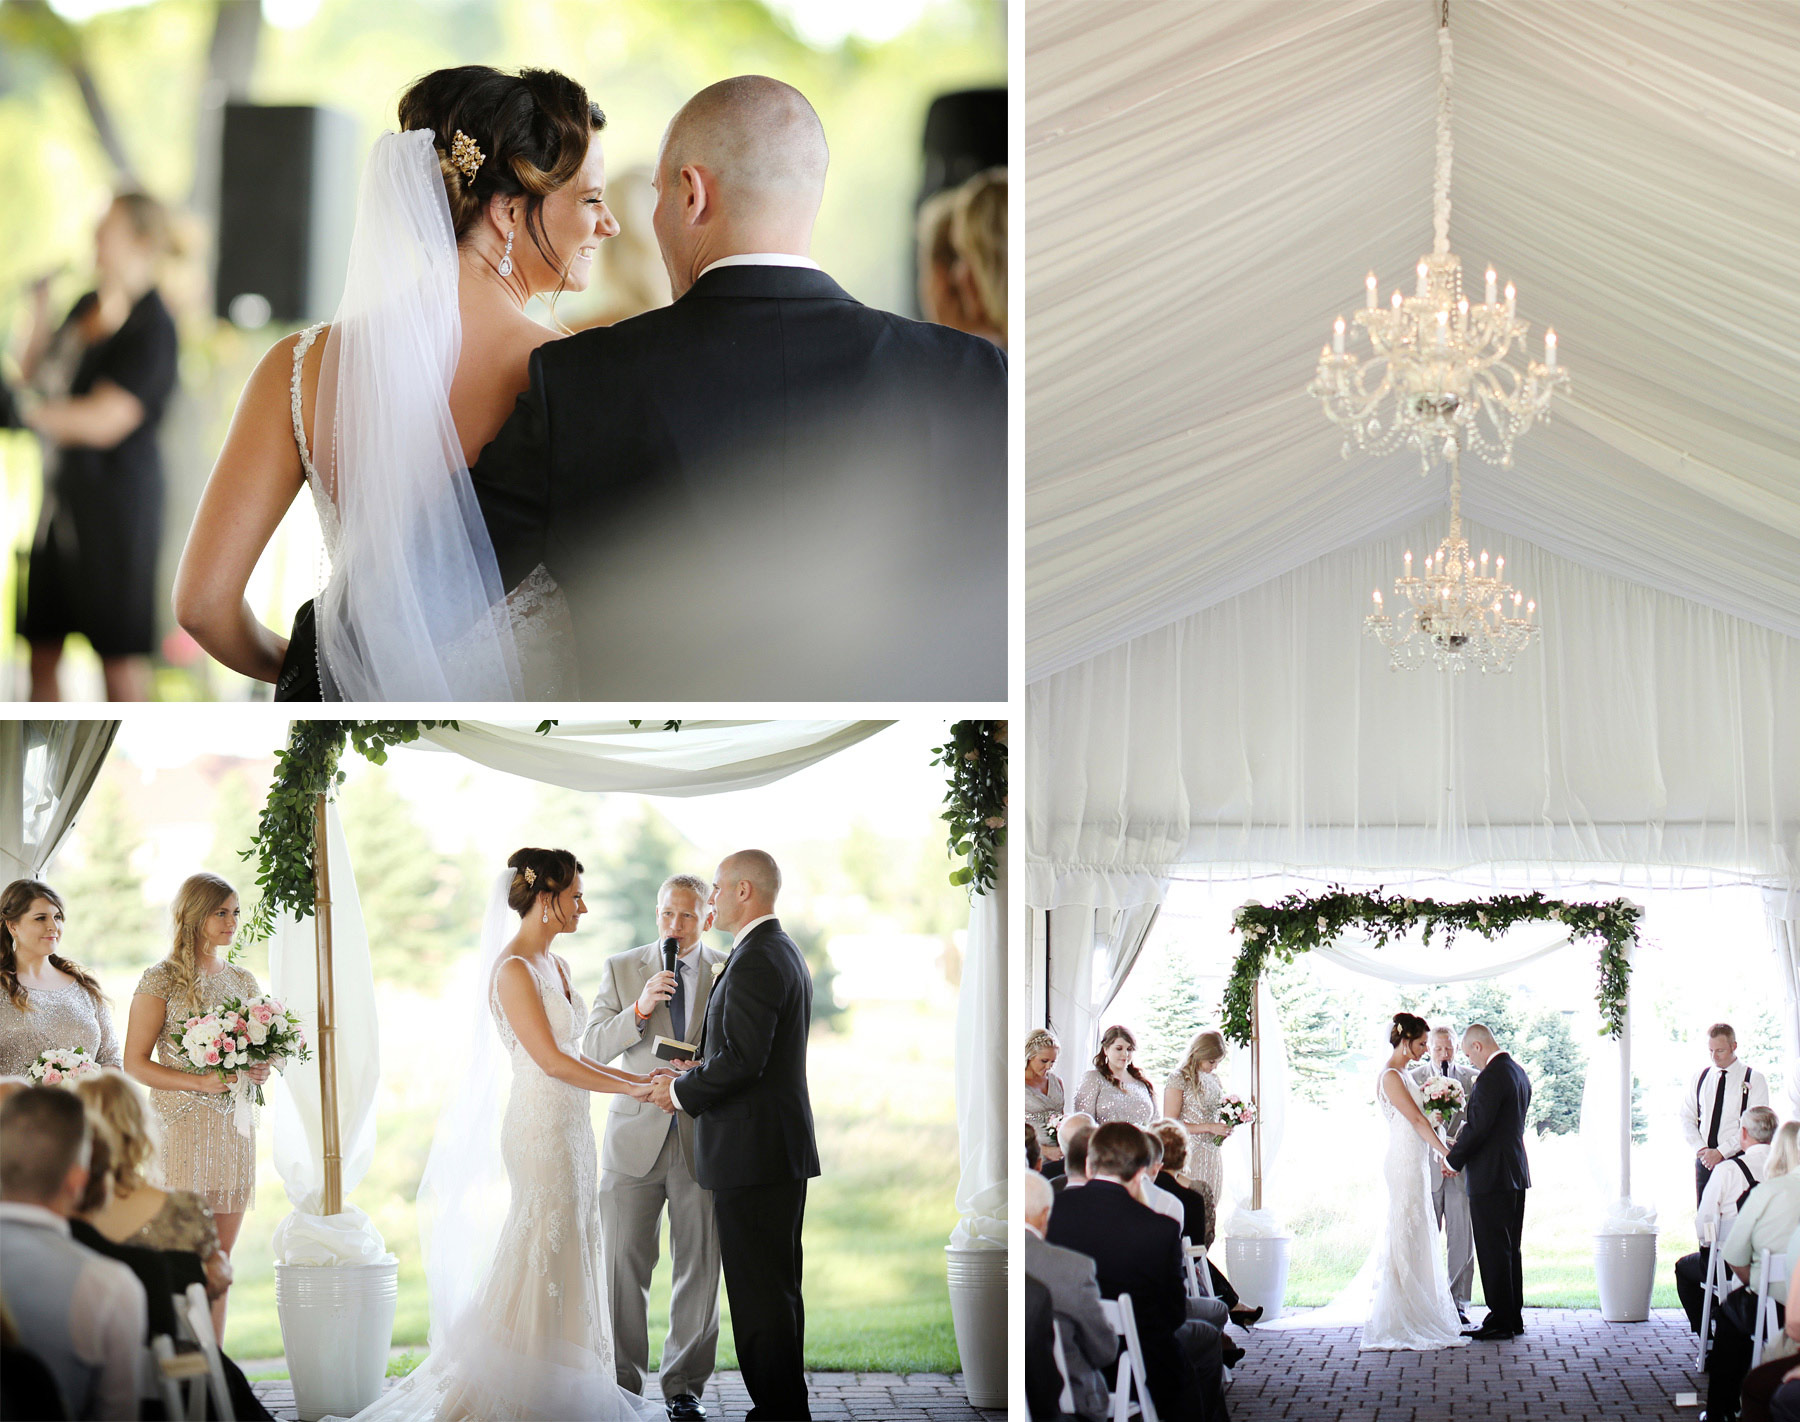 13-Stillwater-Minnesota-Wedding-Photography-by-Vick-Photography-Outdoor-Ceremony-Tara-&-Ryan.jpg